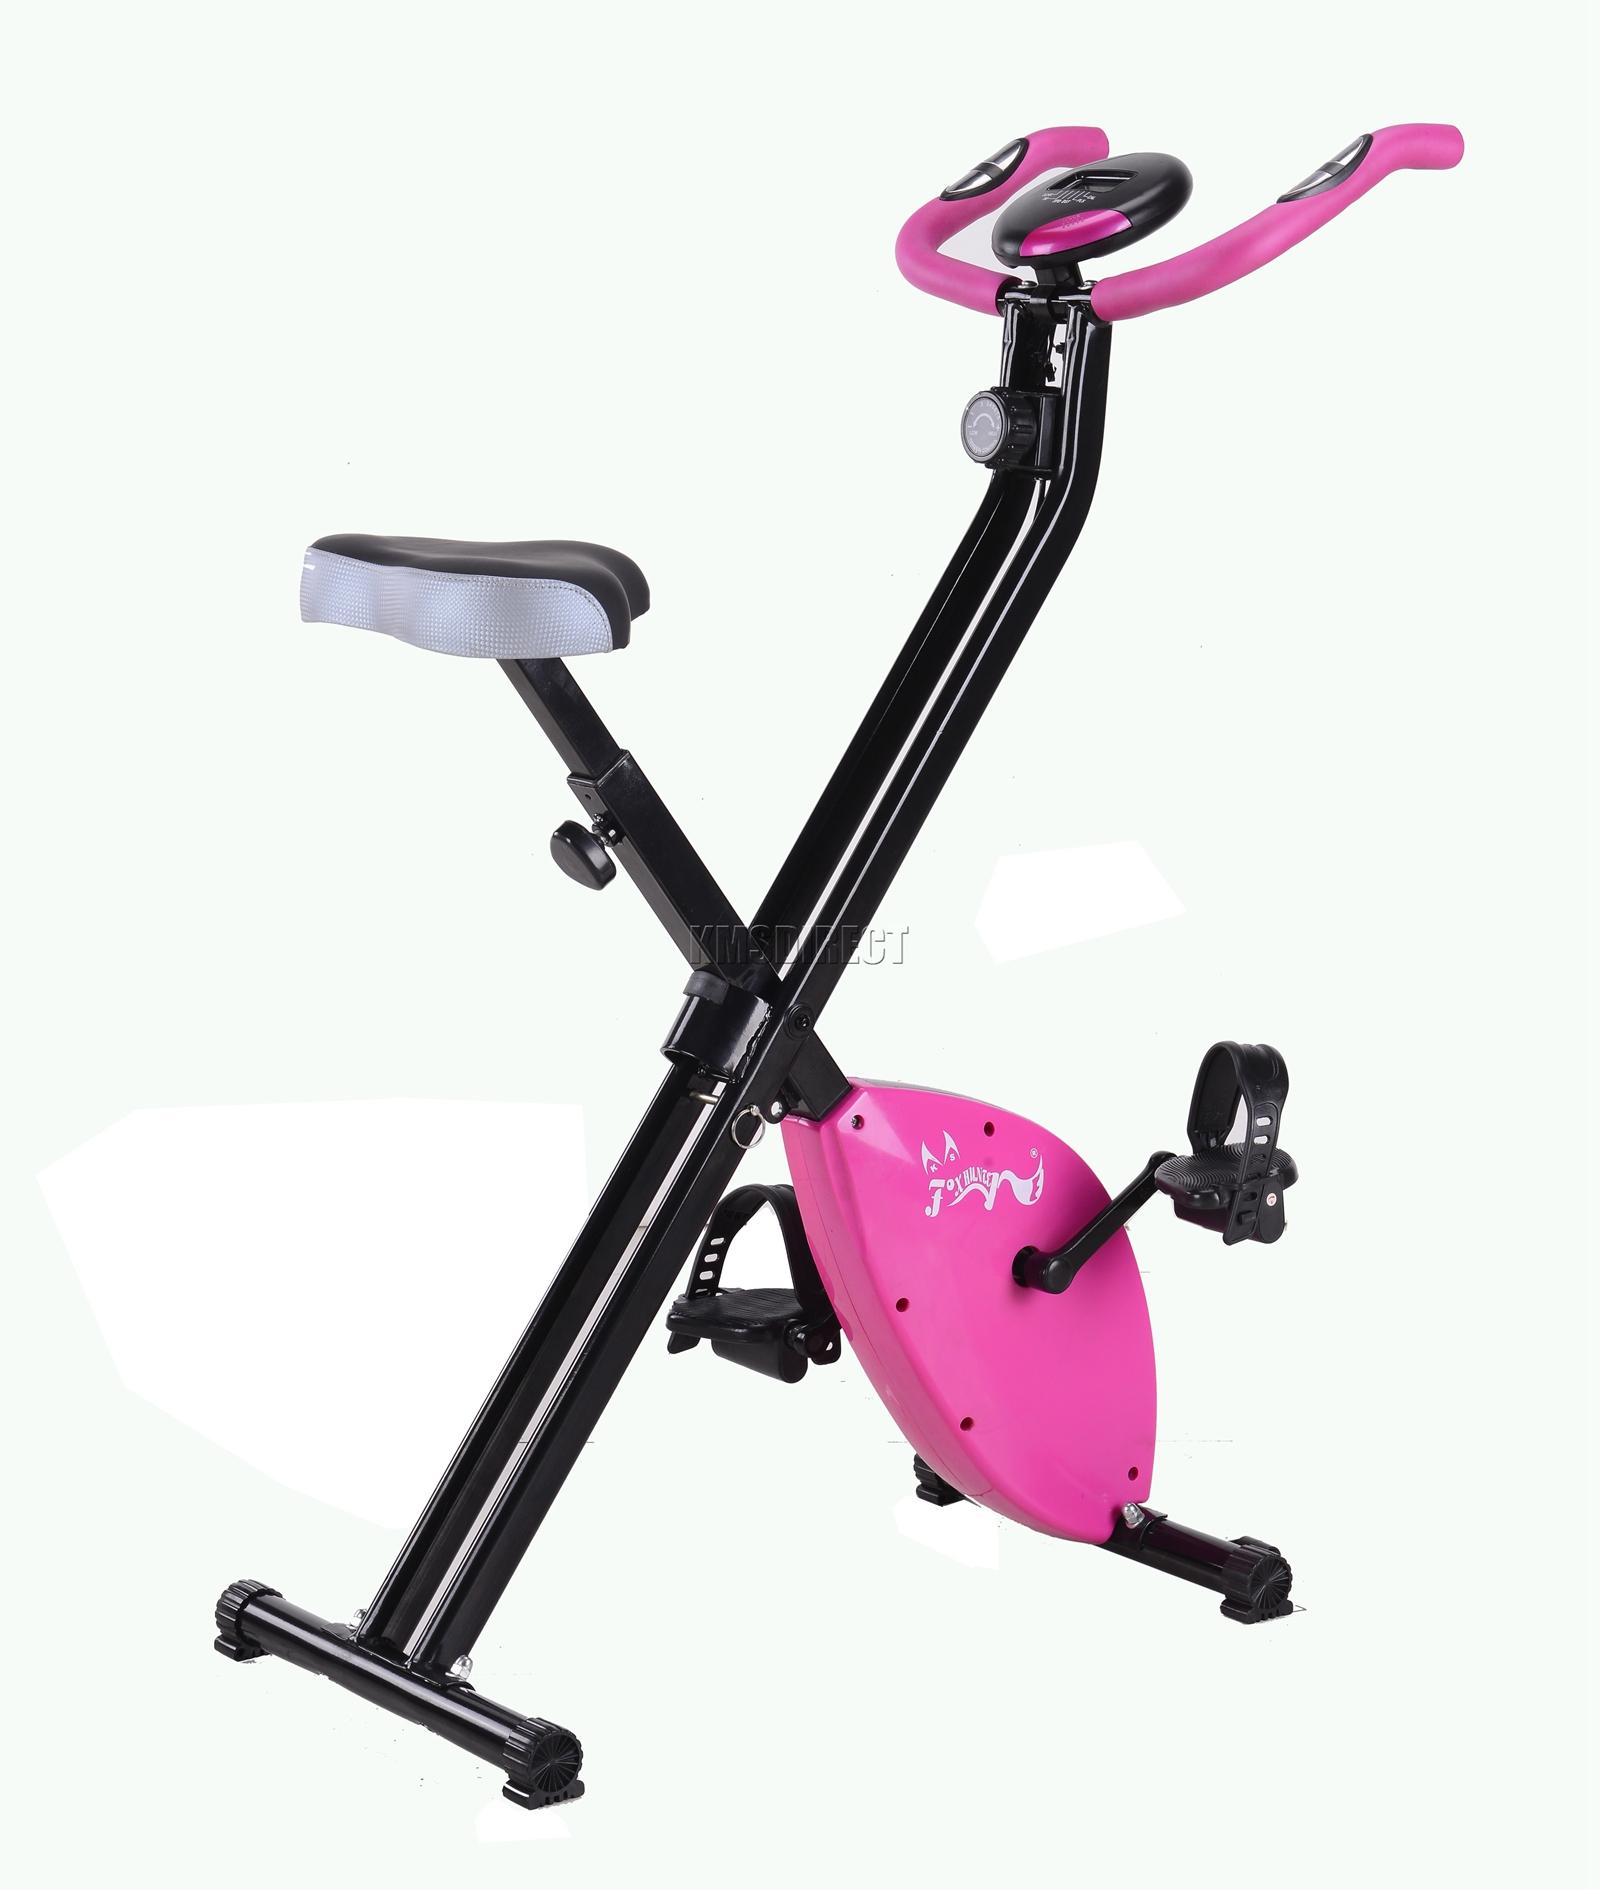 FoxHunter Exercise Bike Folding Magnetic X-Bike Cardio ...